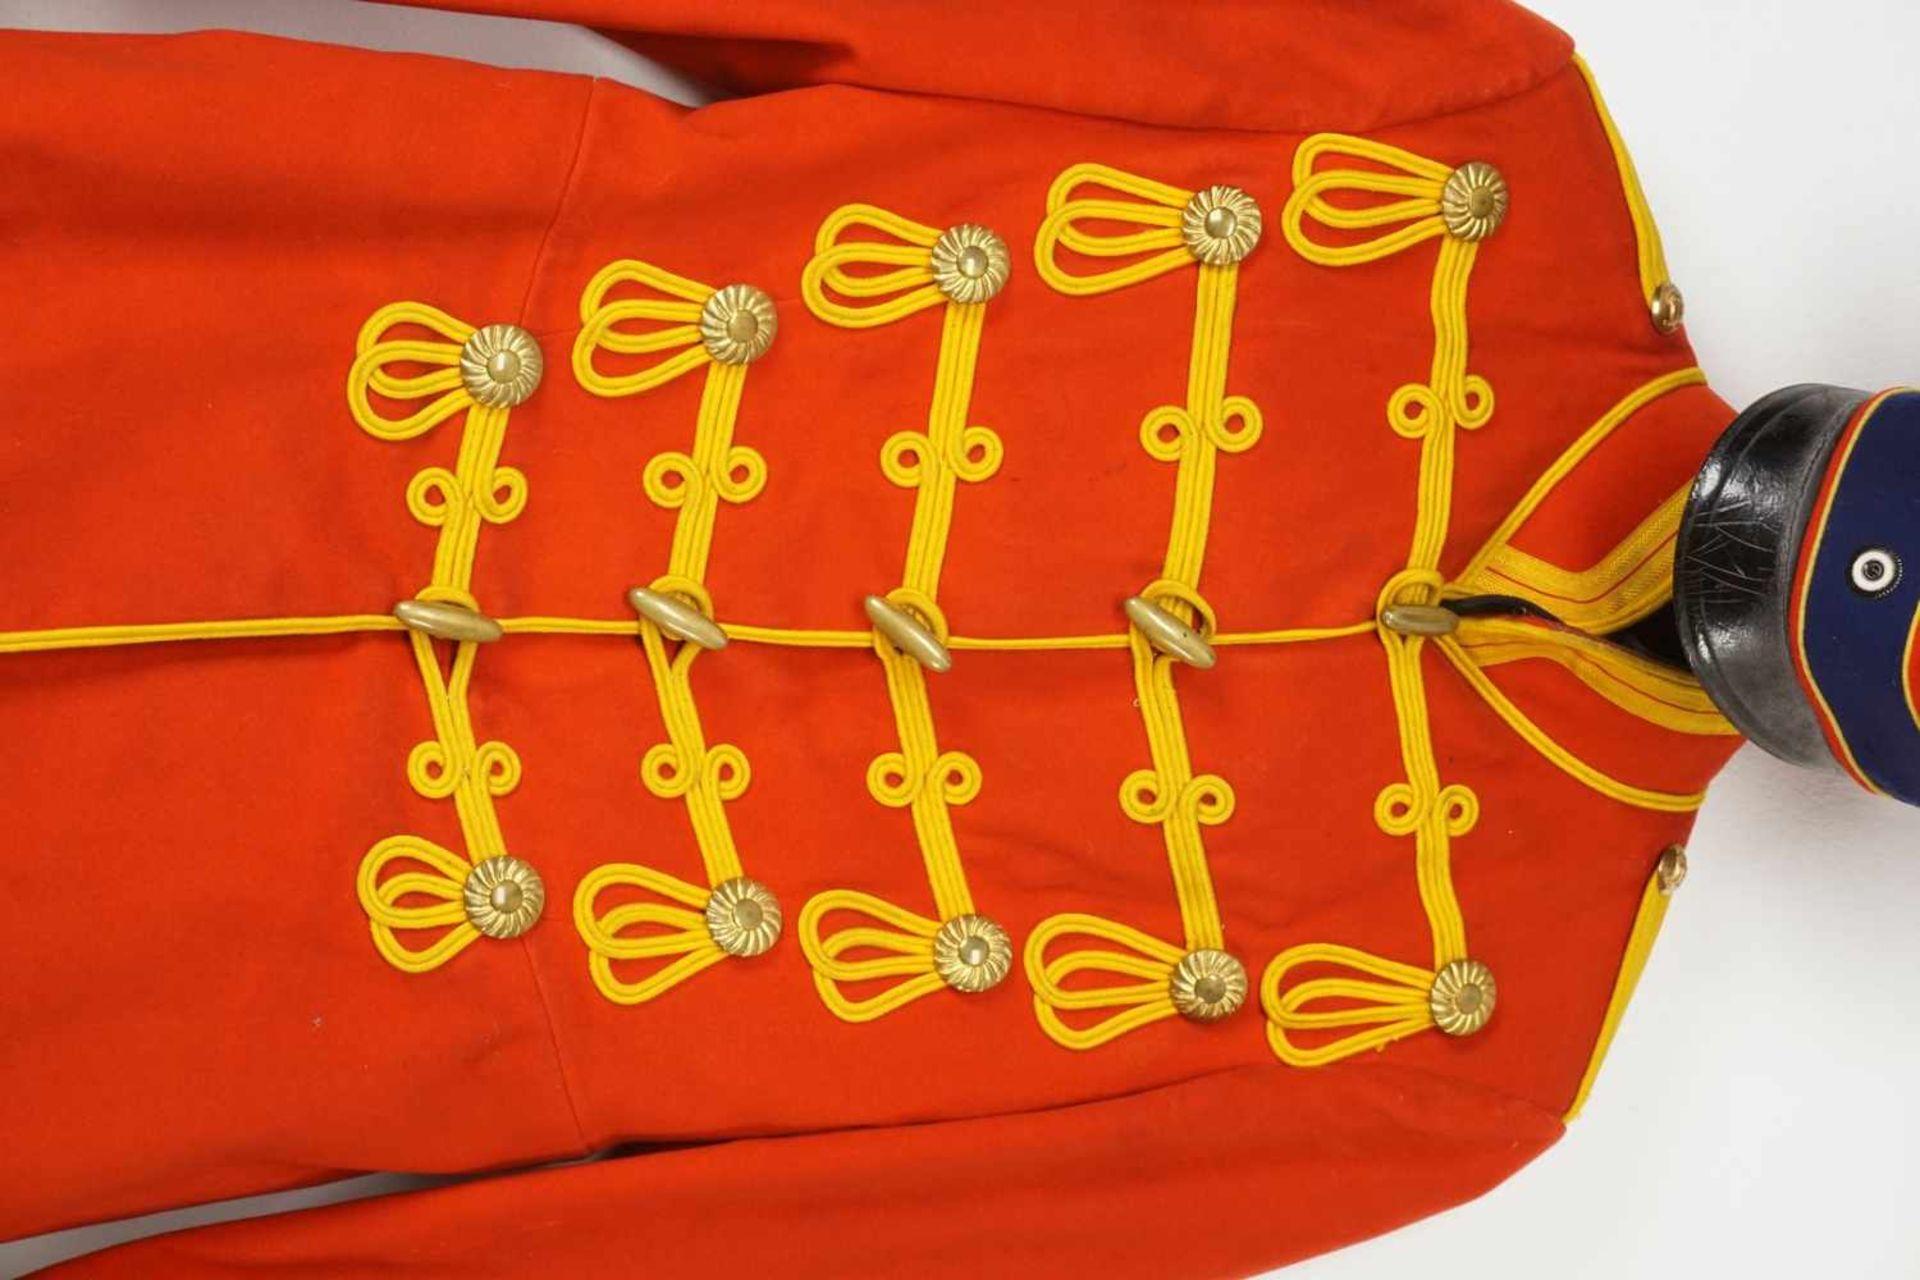 Uniform des Leib-Garde-Husaren-Regiments Potsdam, um 1900 - Bild 6 aus 9